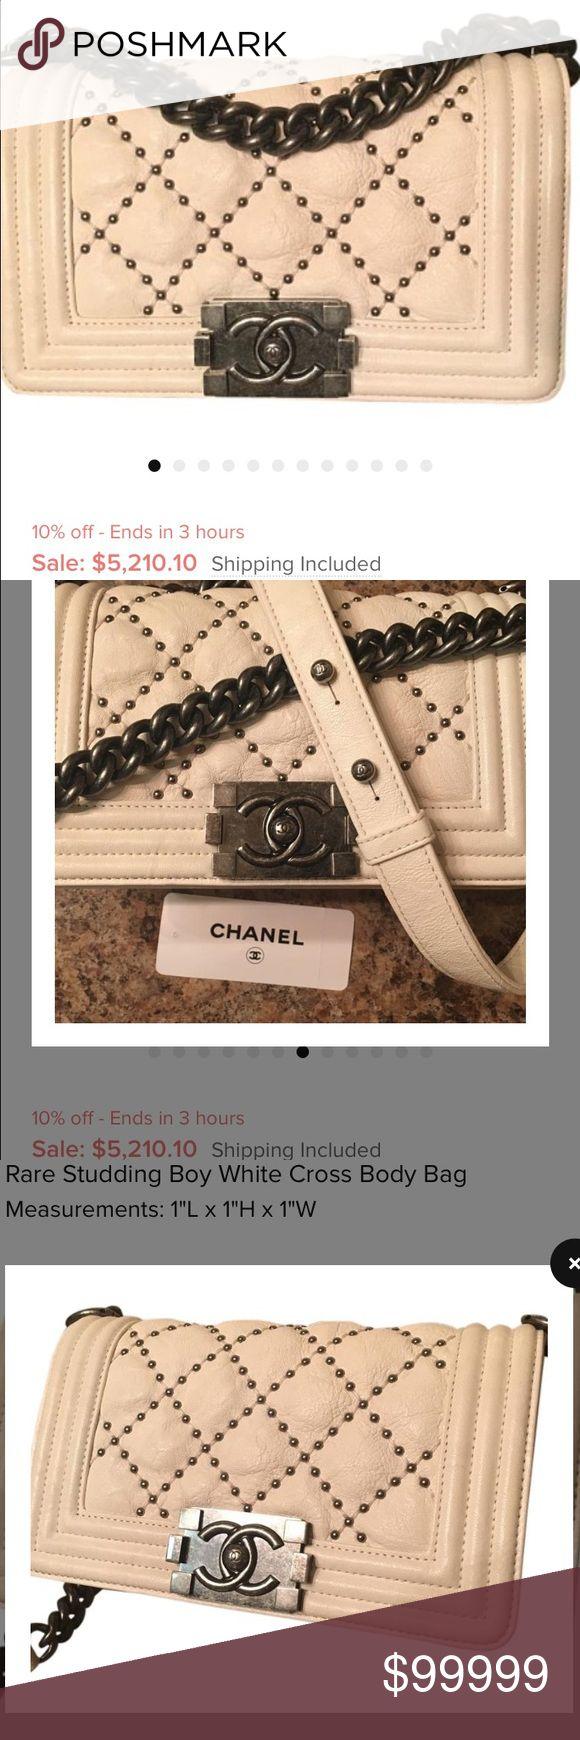 CHANEL BOY BAG Authentic Chanel boy bag SALE!!! CHANEL Bags Crossbody Bags